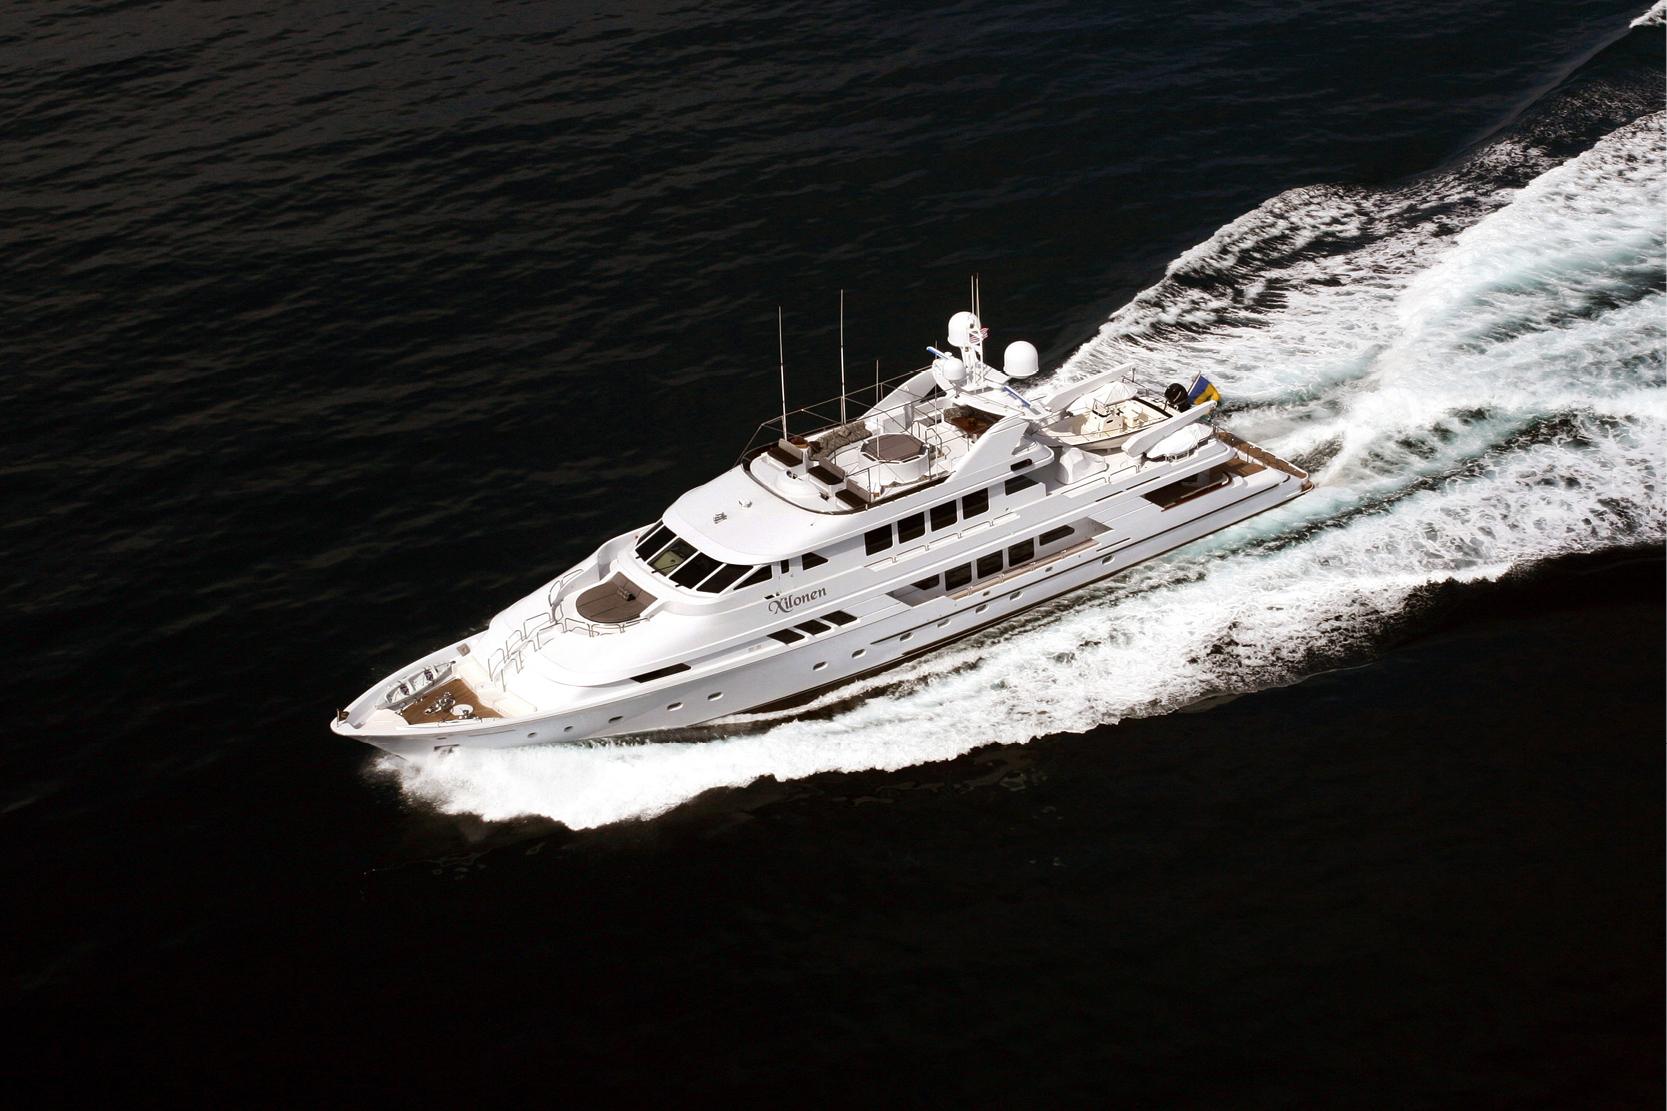 Karen-Lynn-Interior-Design-Yacht-Xilonen_28.jpg